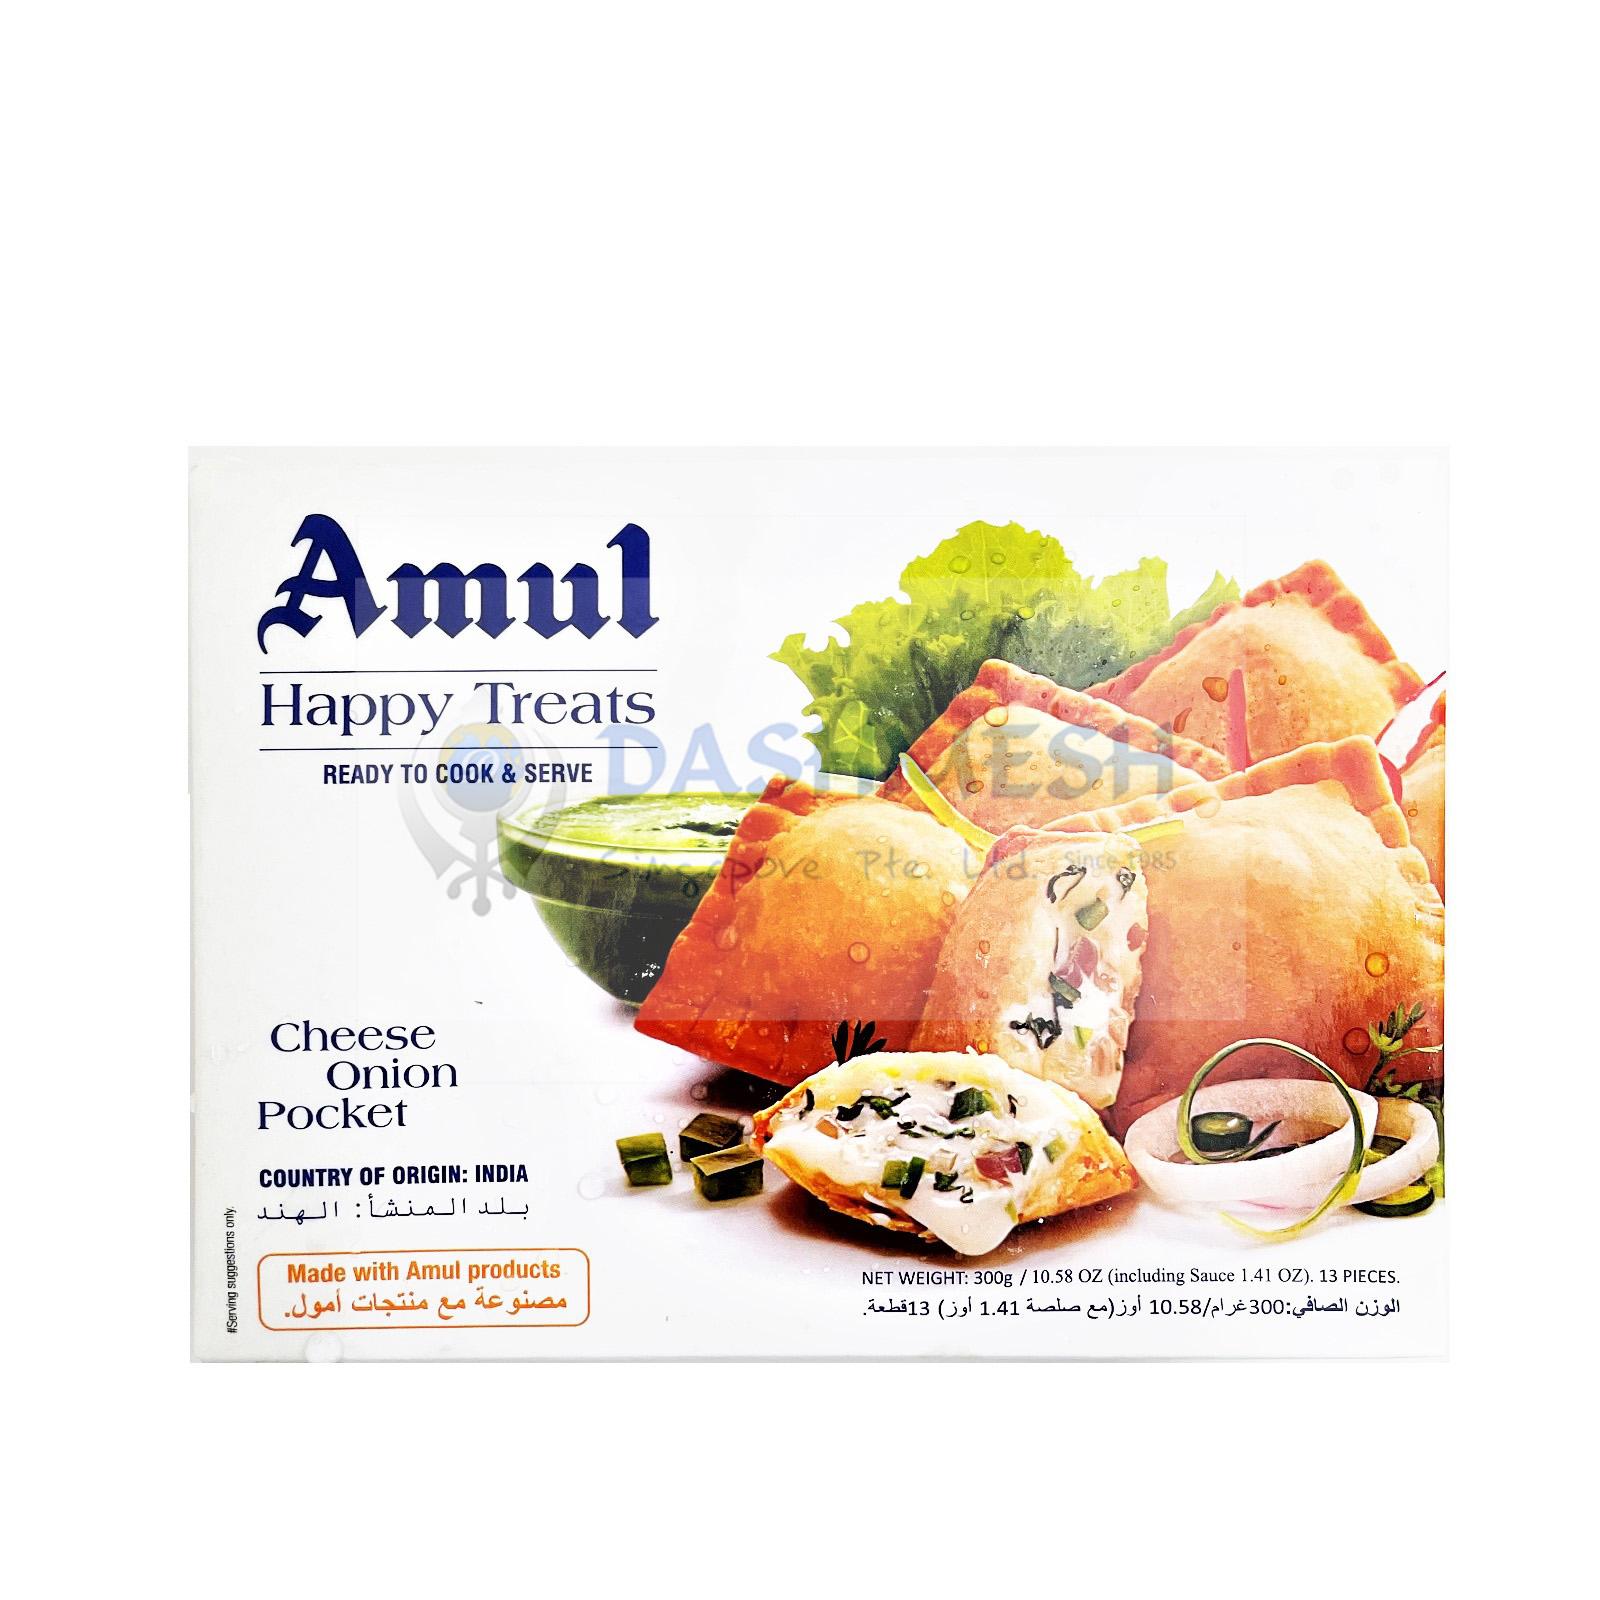 Amul Cheese Onion Pocket 300g